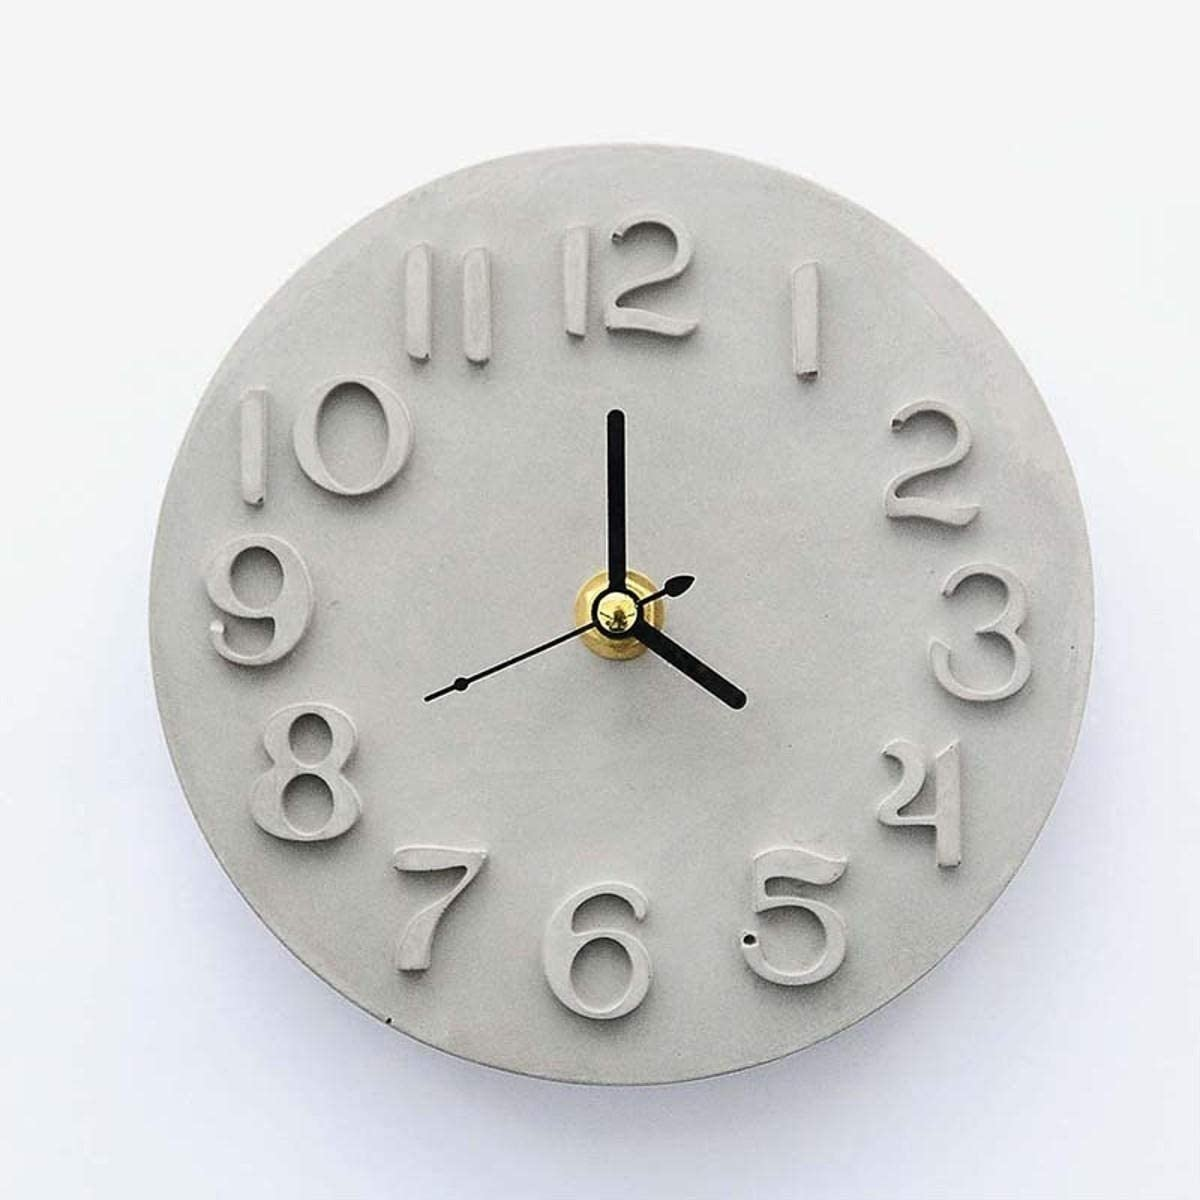 Reloj de pared LANQ